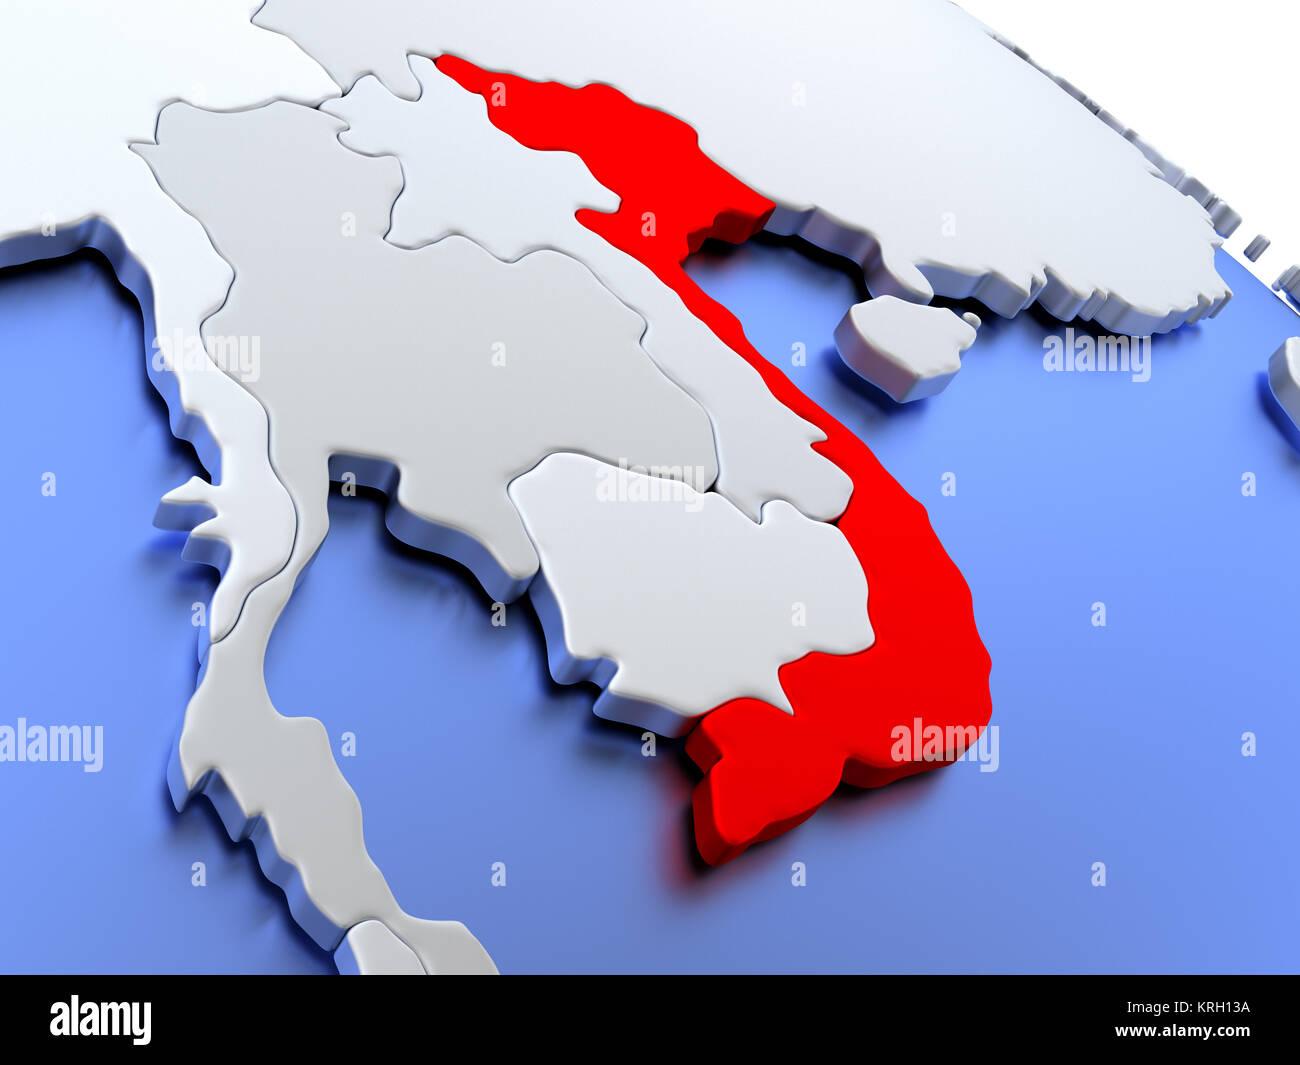 Vietnam on world map Stock Photo: 169404462 - Alamy